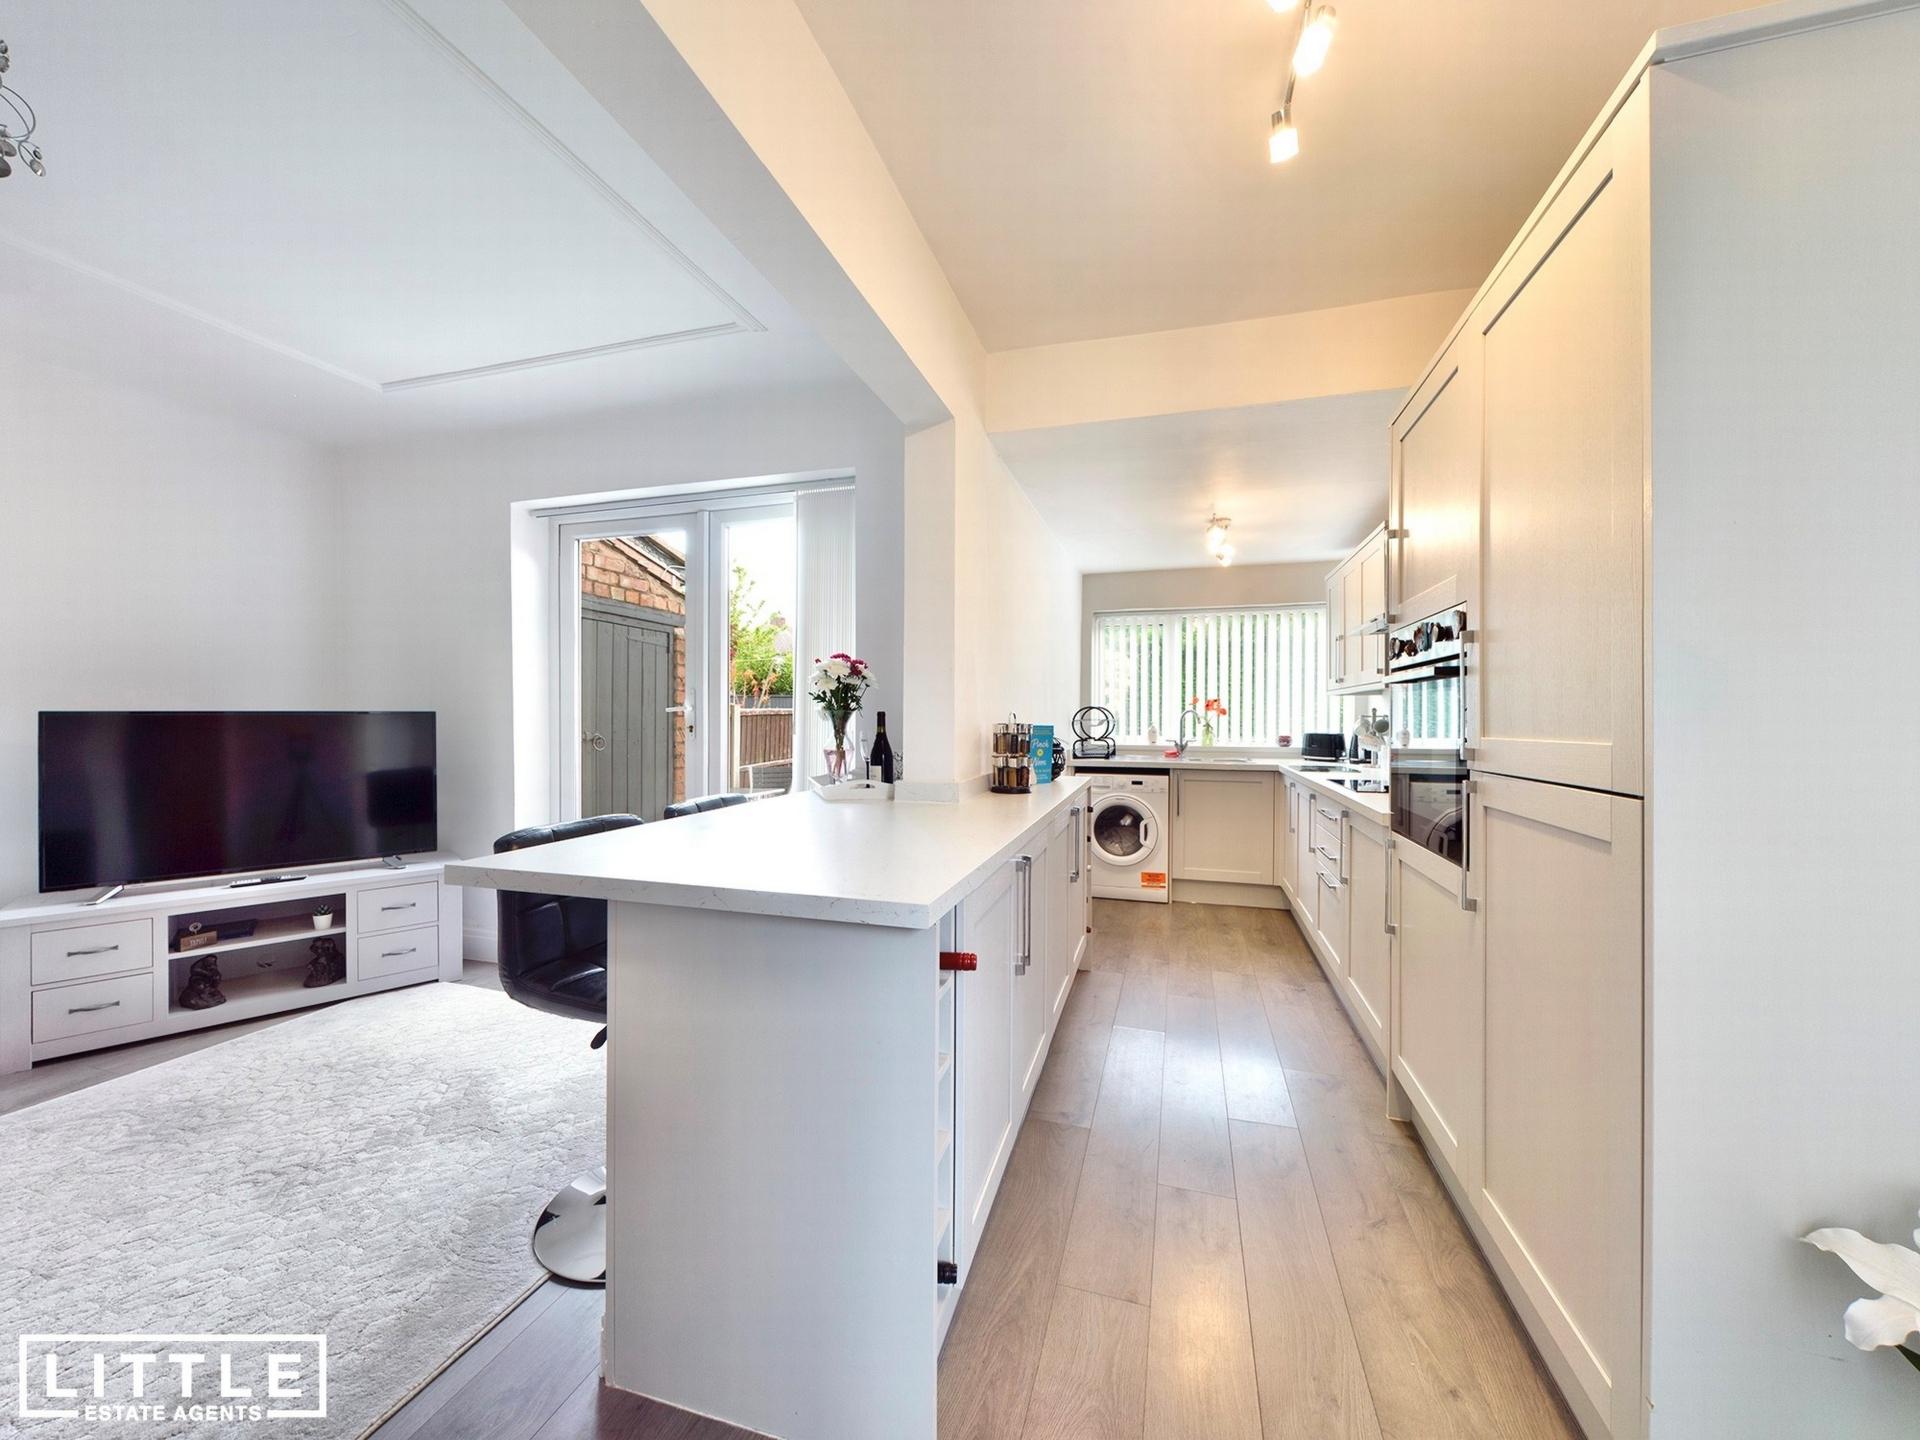 Kitchen/living room